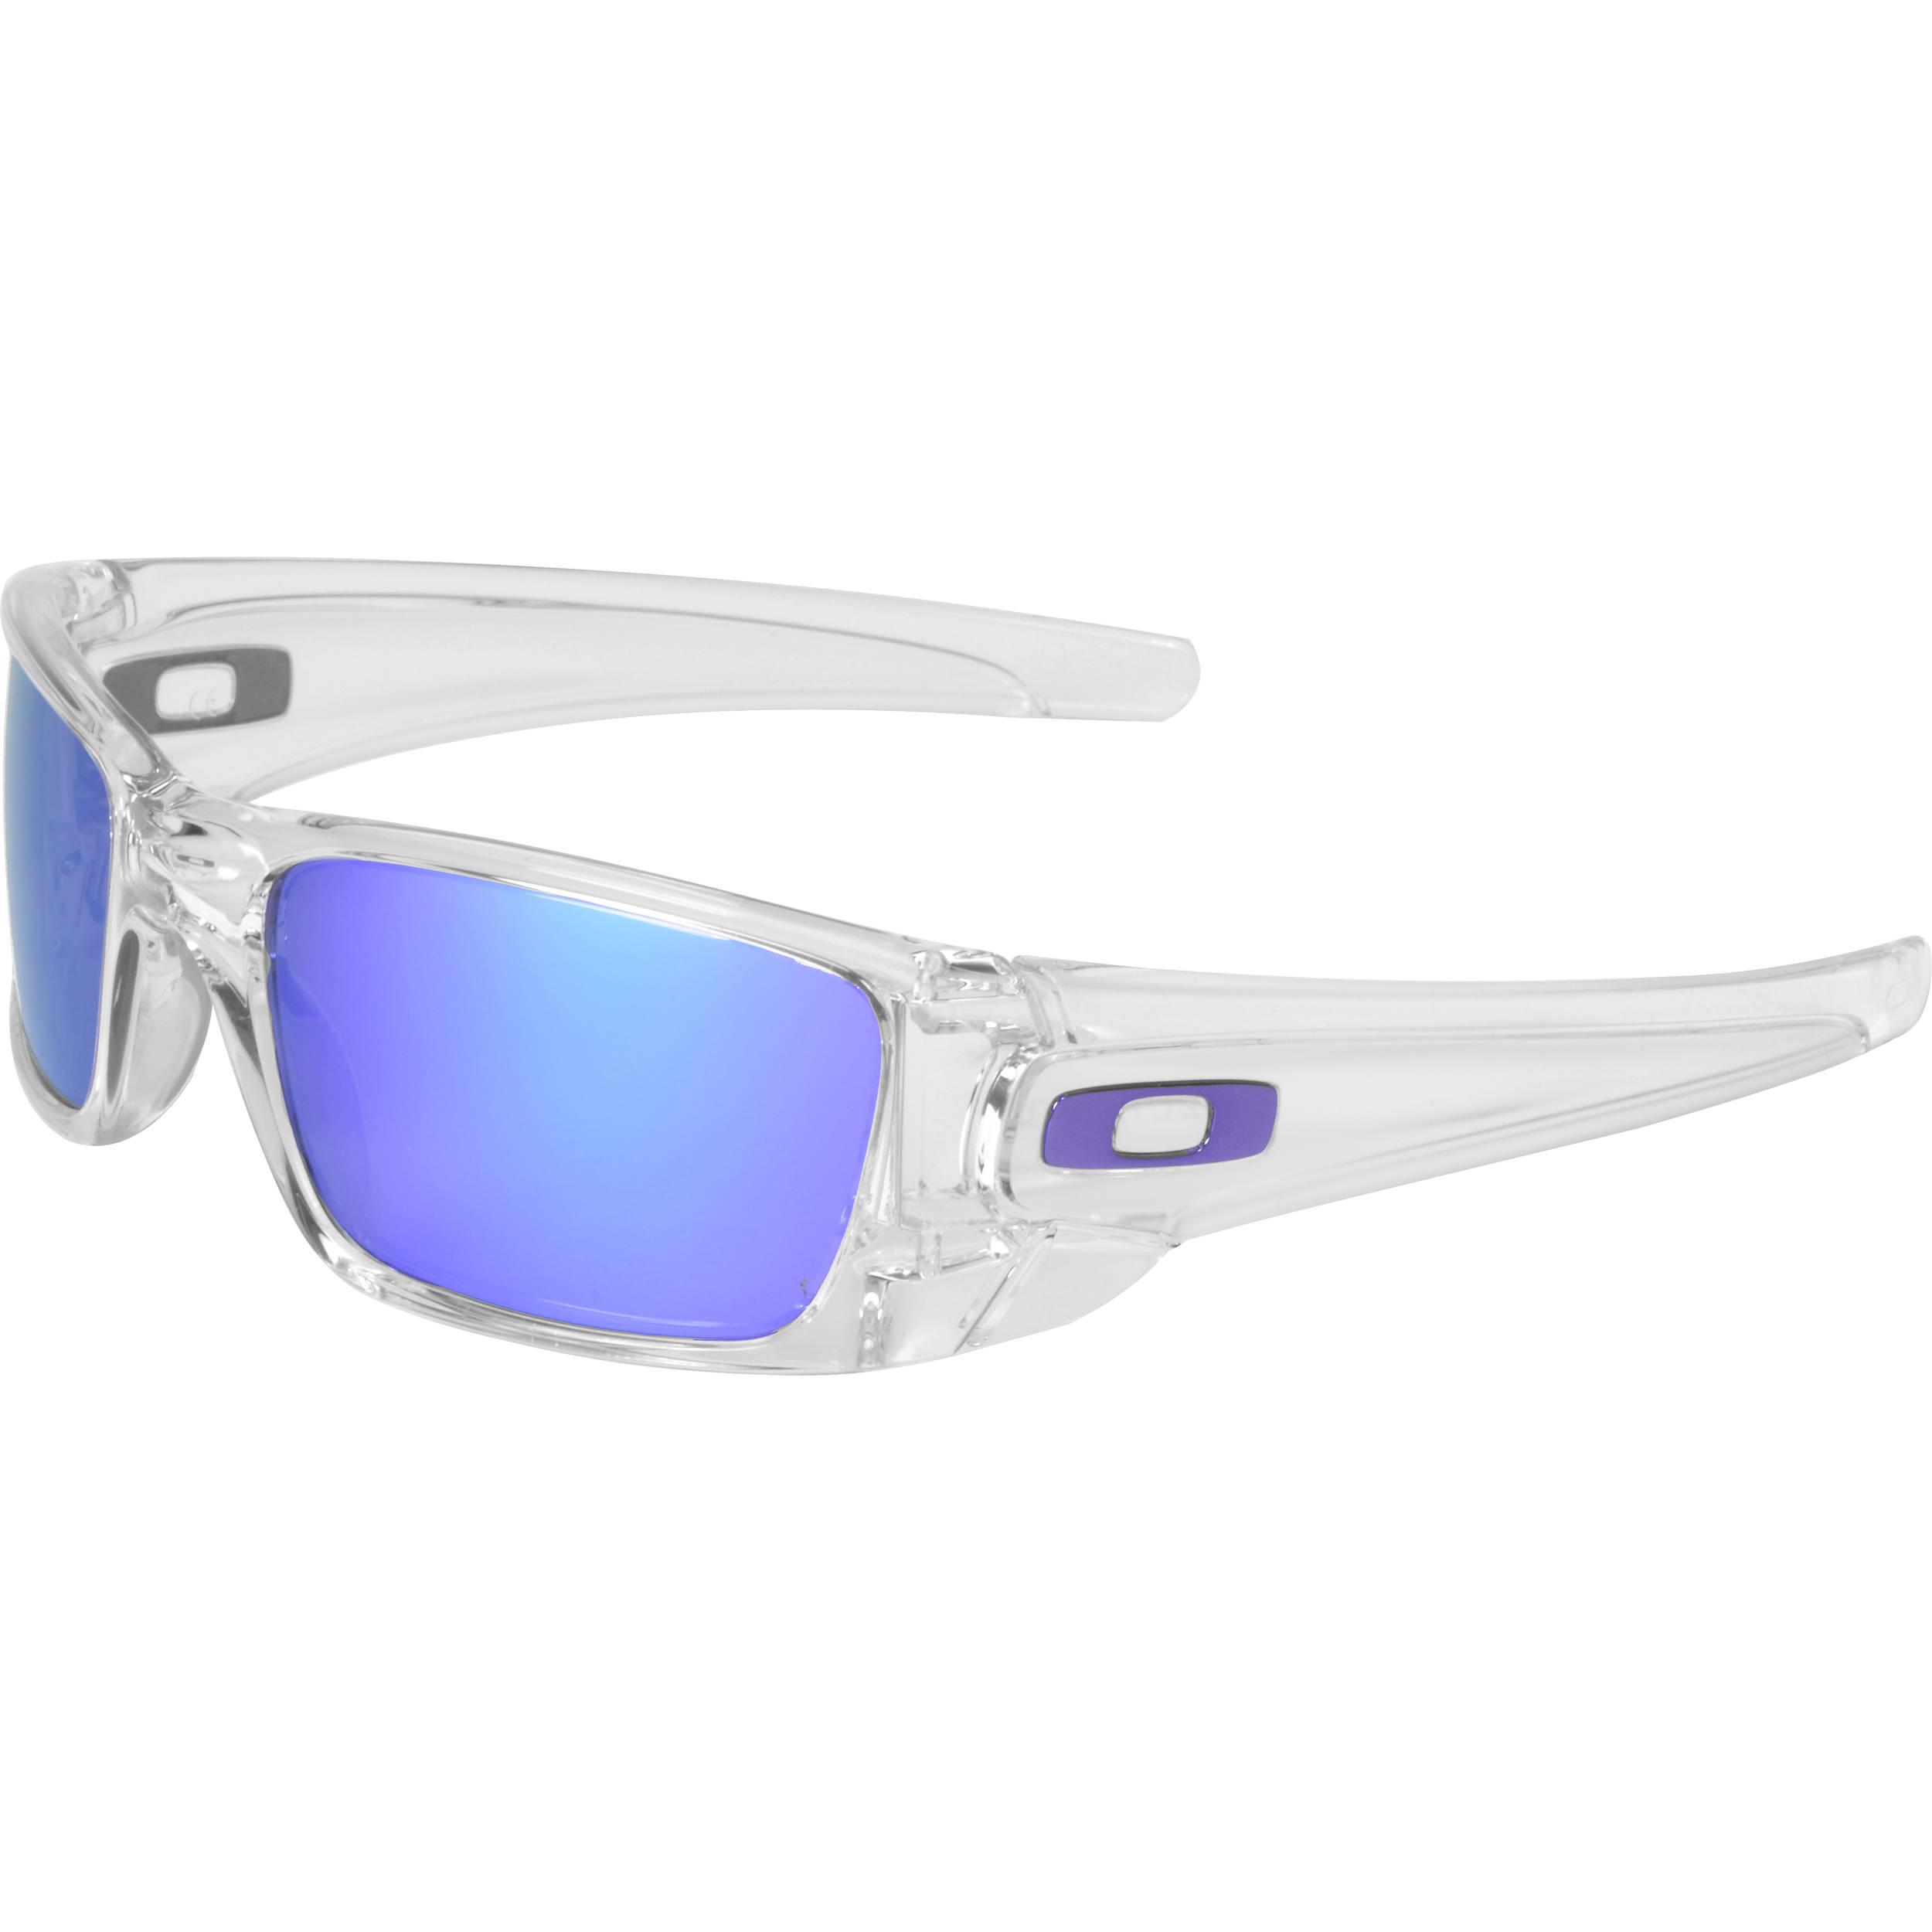 Buy and Save up to 60% on Discount Designer Eyewear Eyeglasses Sunglasses Prescription Glasses Frames Contact Lenses.